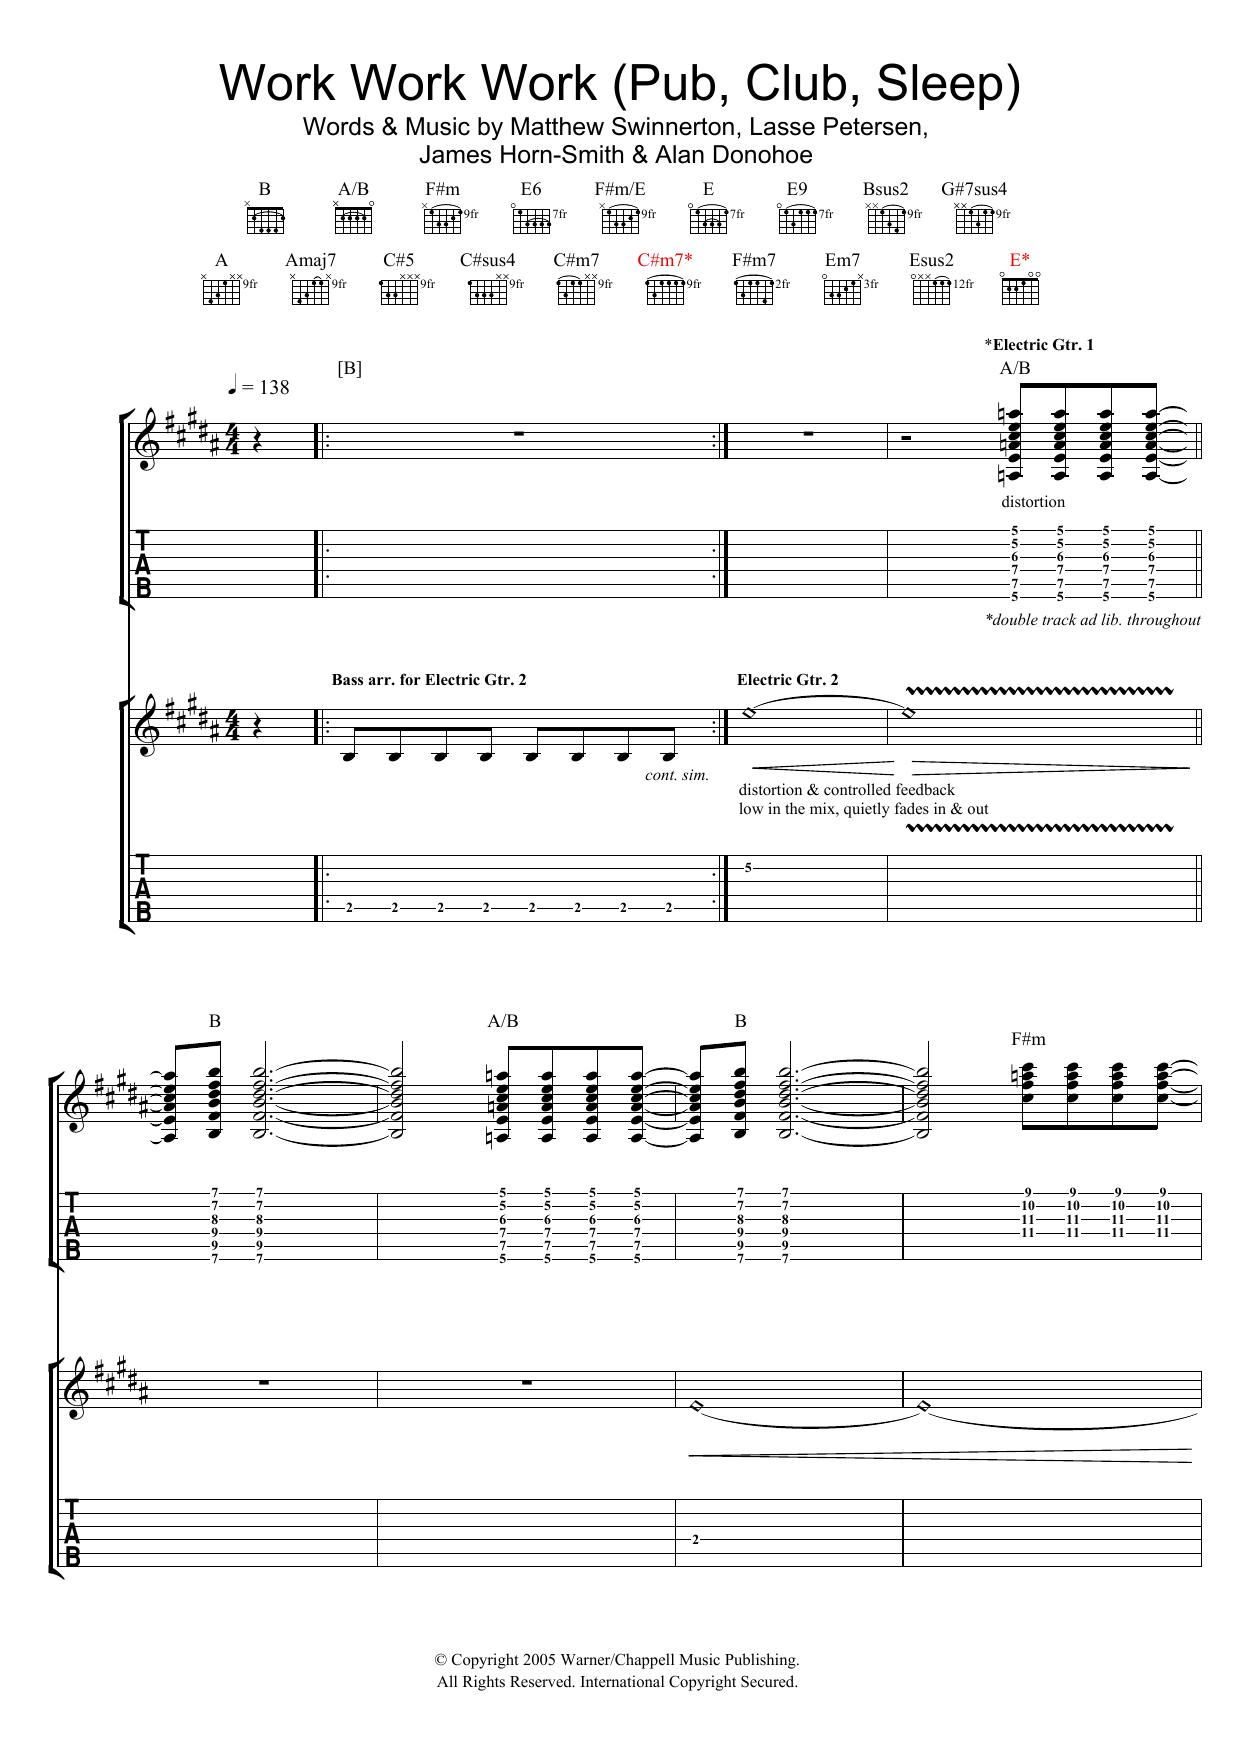 Work Work Work (Pub, Club, Sleep) (Guitar Tab)